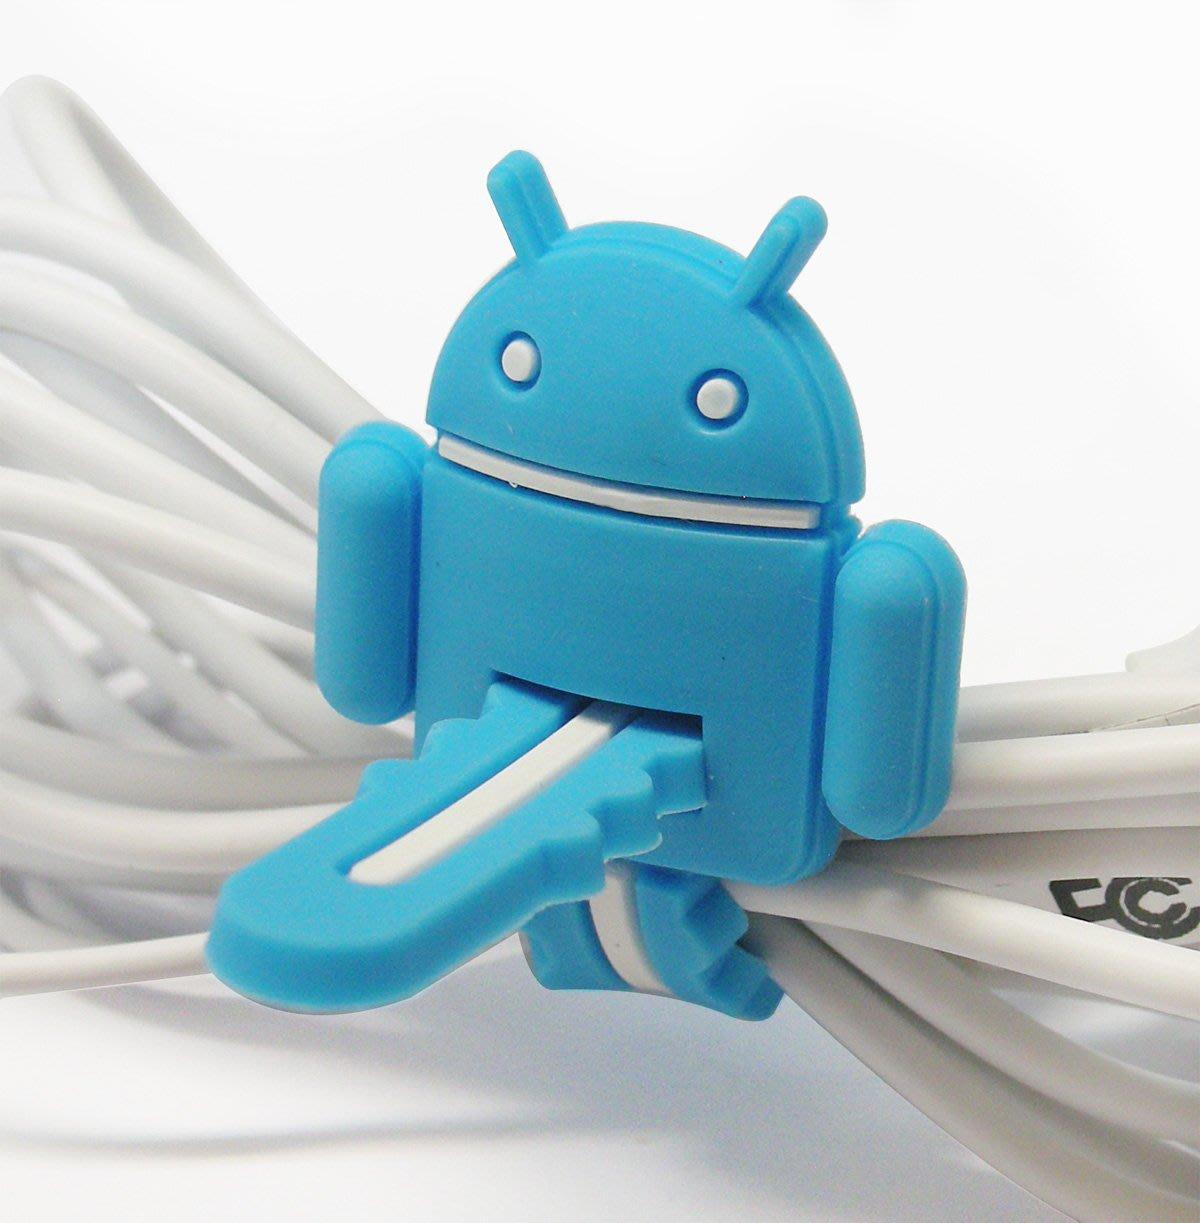 L13-1~電線束帶/Samsung 三星 I9300 alaxy alaxy/nano classic iPod to